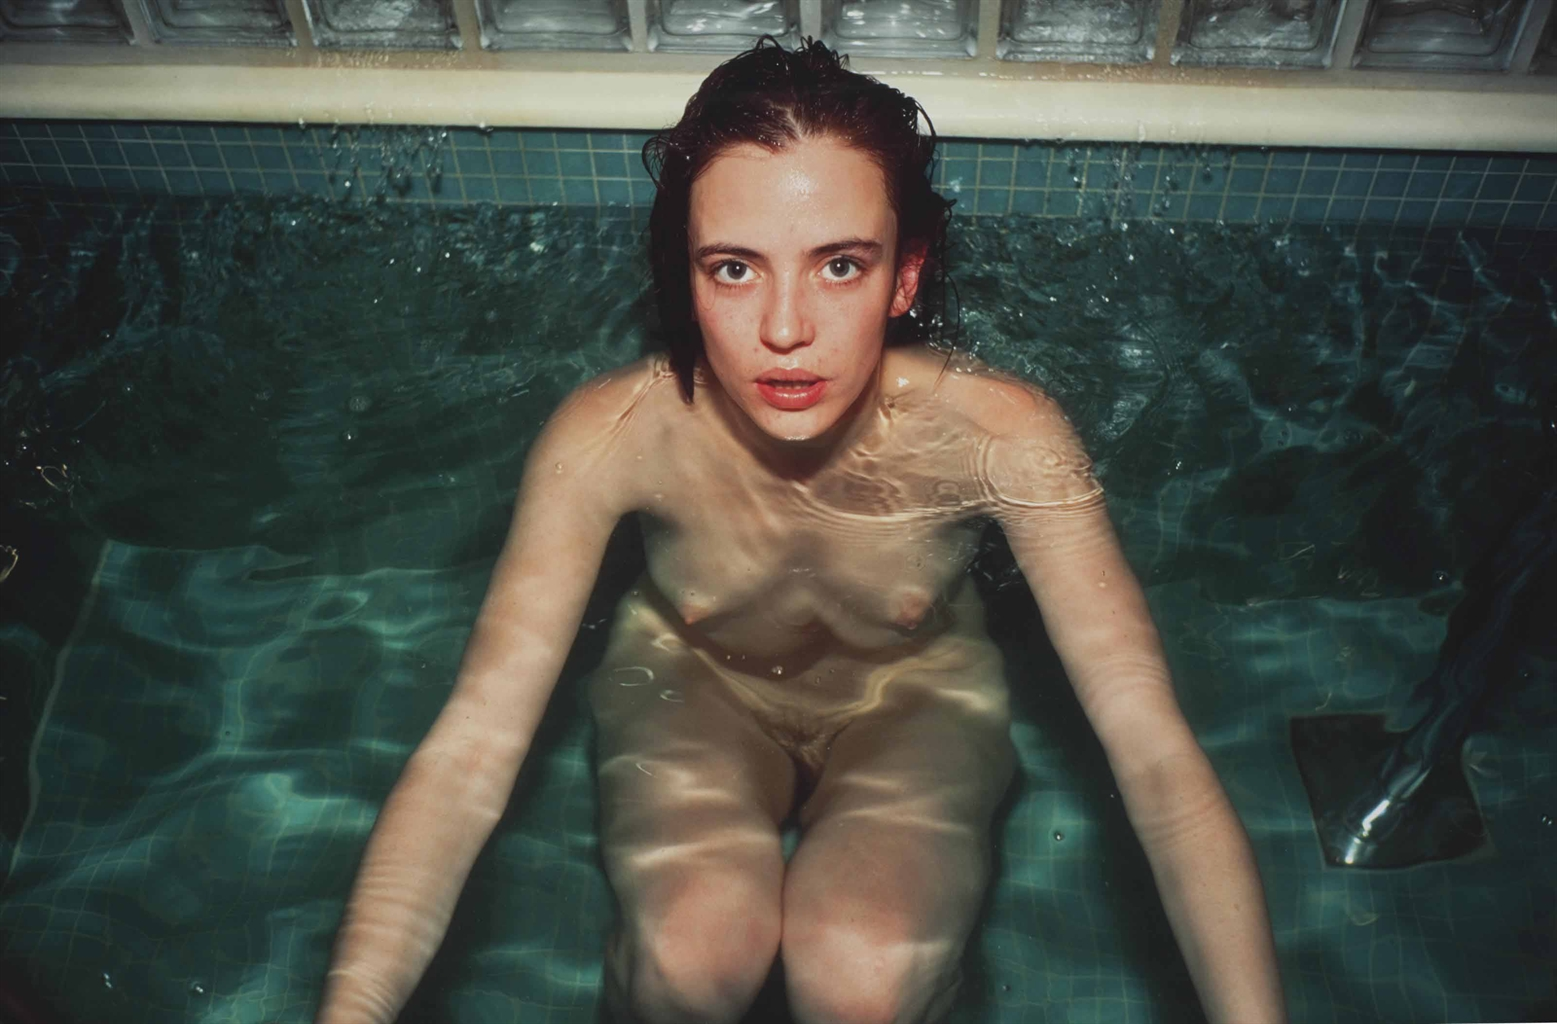 Amanda Ooms d5718586a | raw, naked art